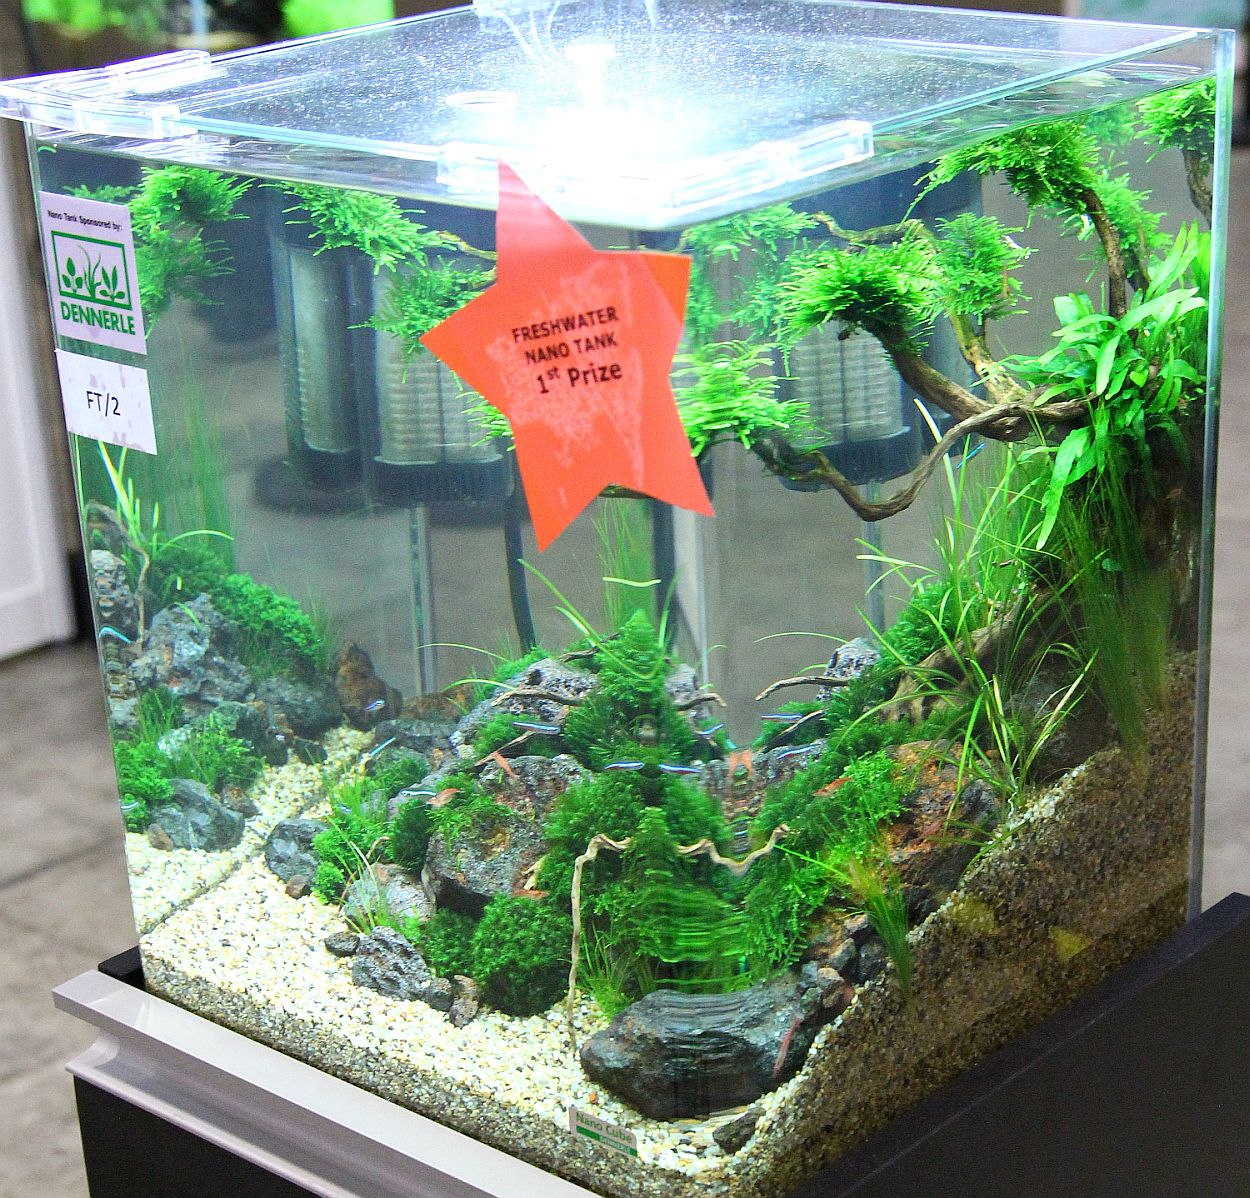 Freshwater aquarium fish nano - Freshwater Nano Tank 1st Prize